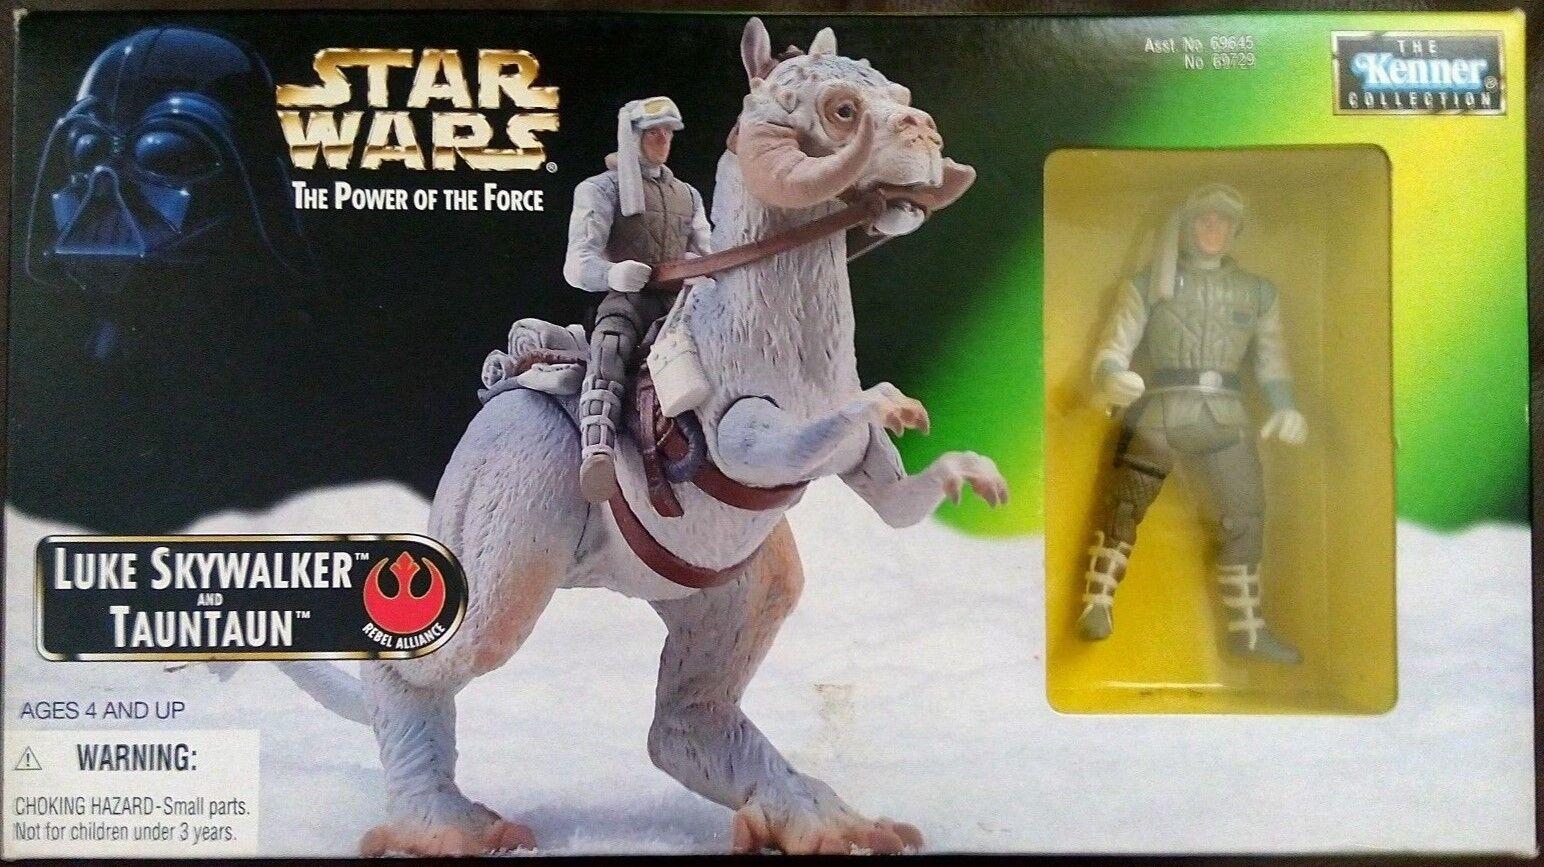 Star Wars  The Power of the Force 1997 Luke Skywalker & Tauntaun